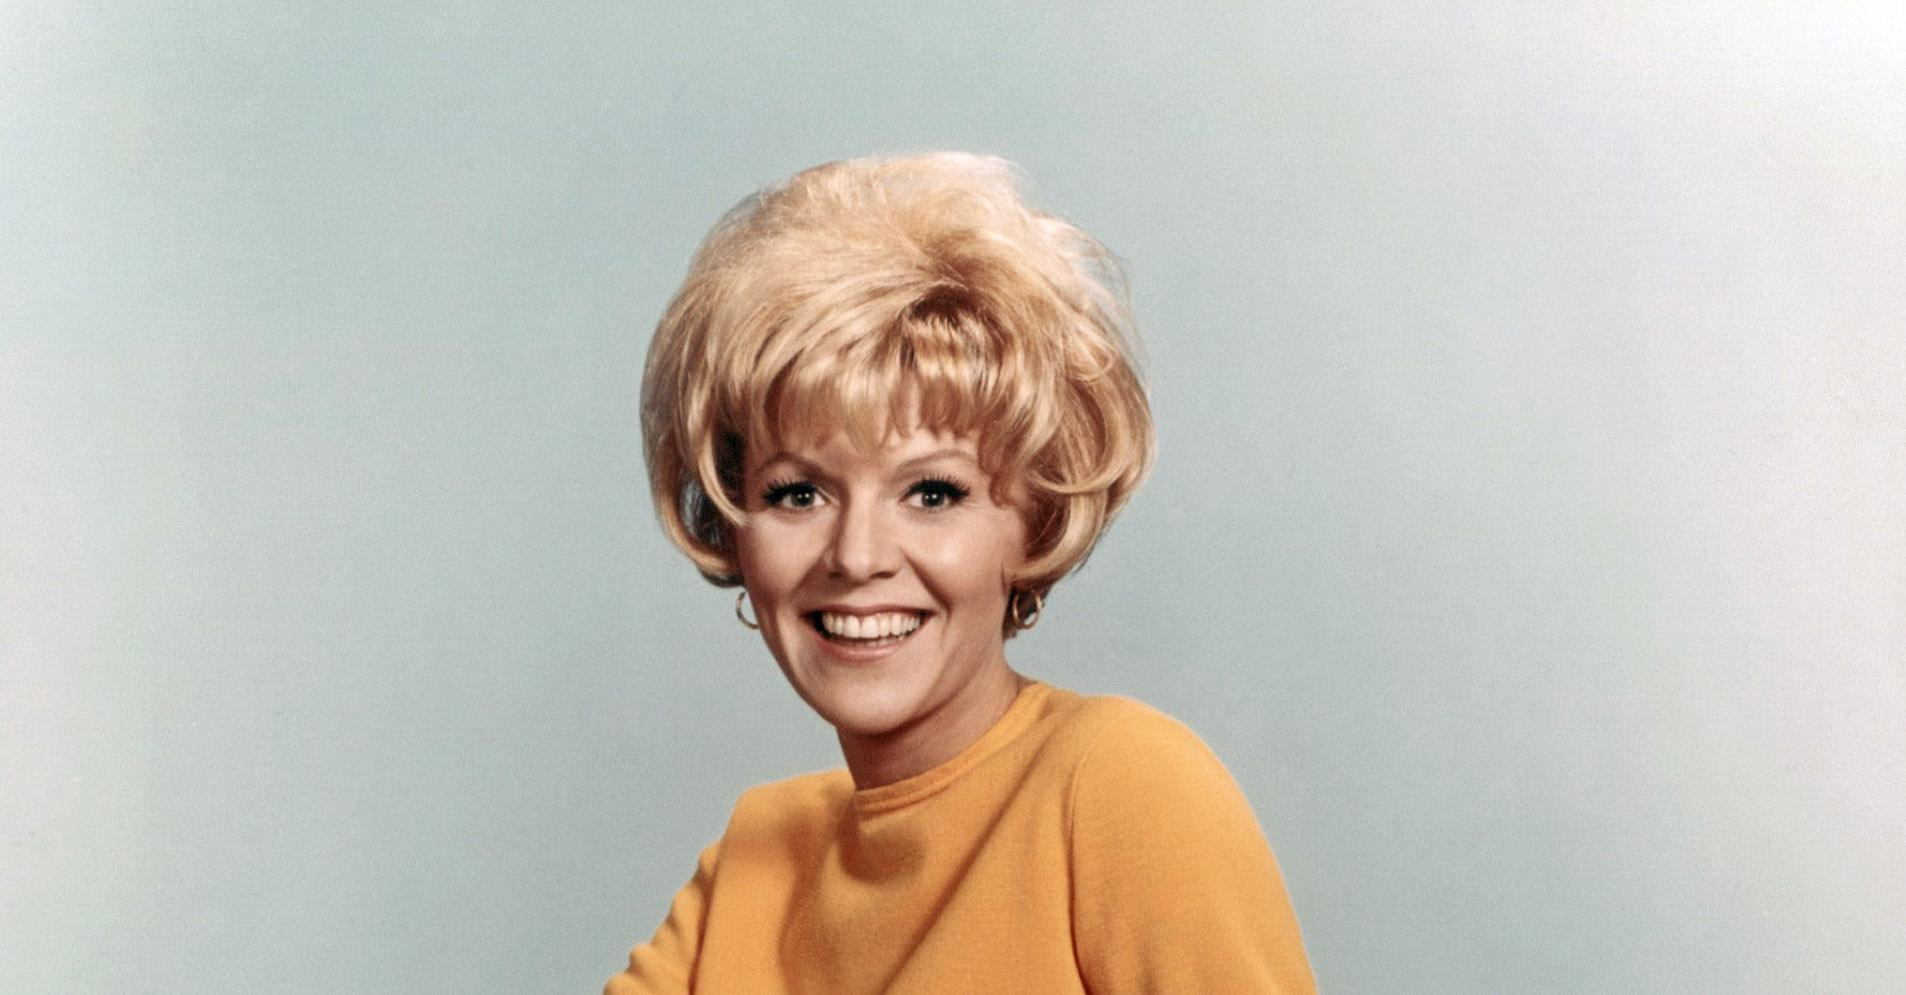 Just In: Mayberry R.F.D. Star Arlene Golonka Dies At 85